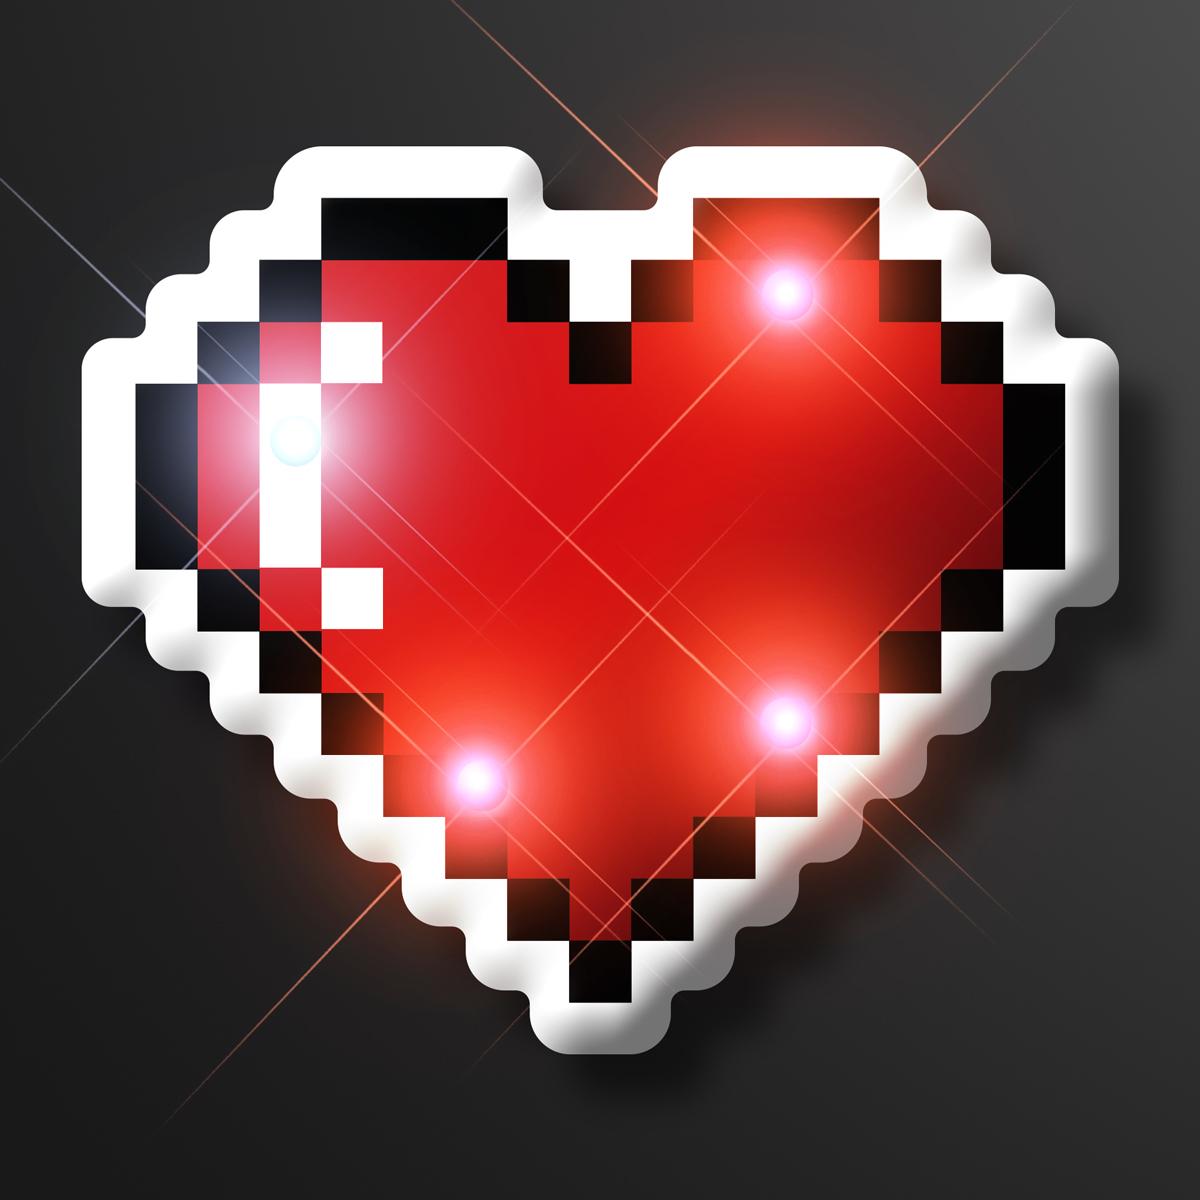 Light Up 8 Bit Pixel Heart Led Pin Flashingblinkylights Download 12,678 pixel heart free vectors. usd